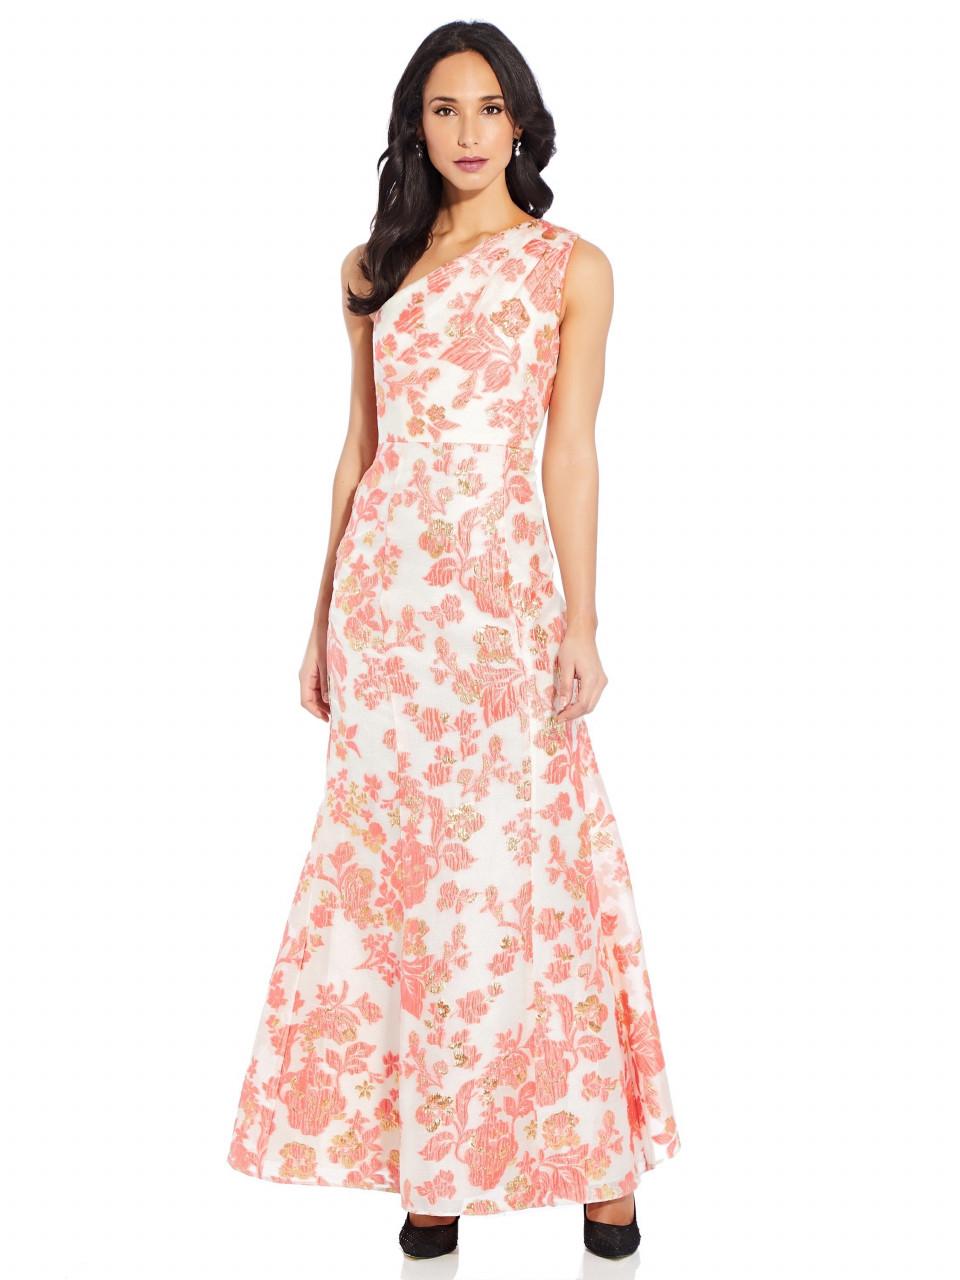 Floral jacquard gown